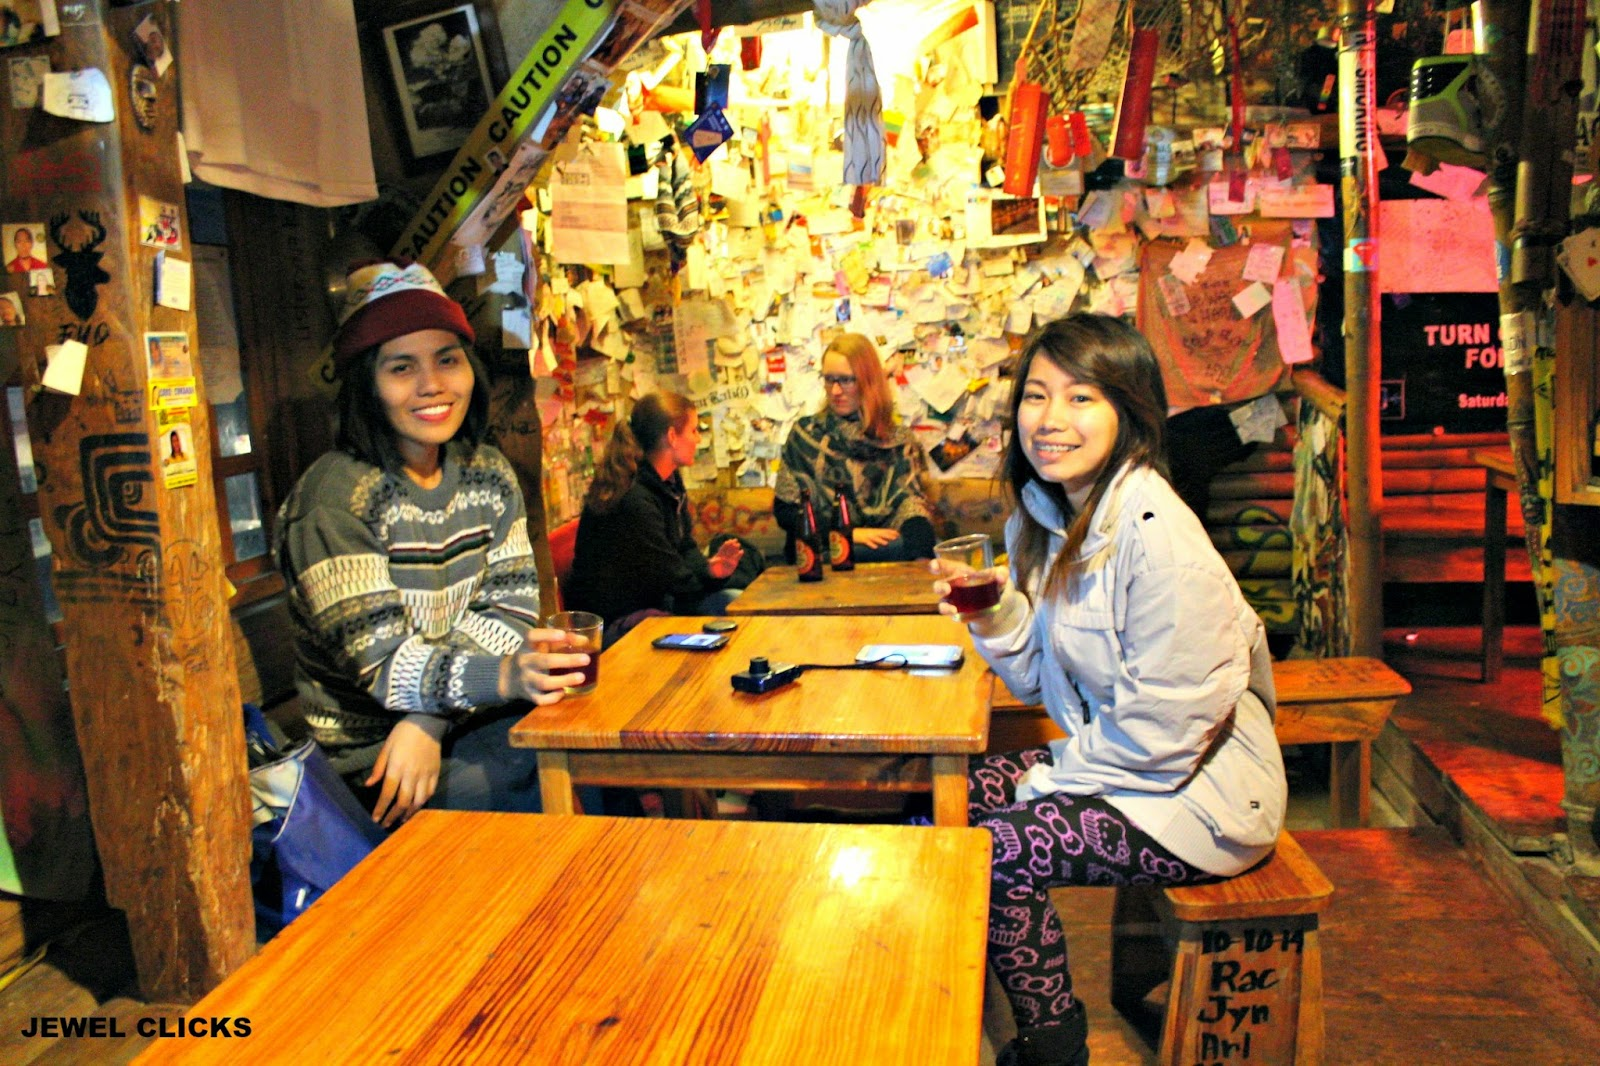 Sagada Pine Cafe Travel 2015 - Jewel Clicks x Island Trotters